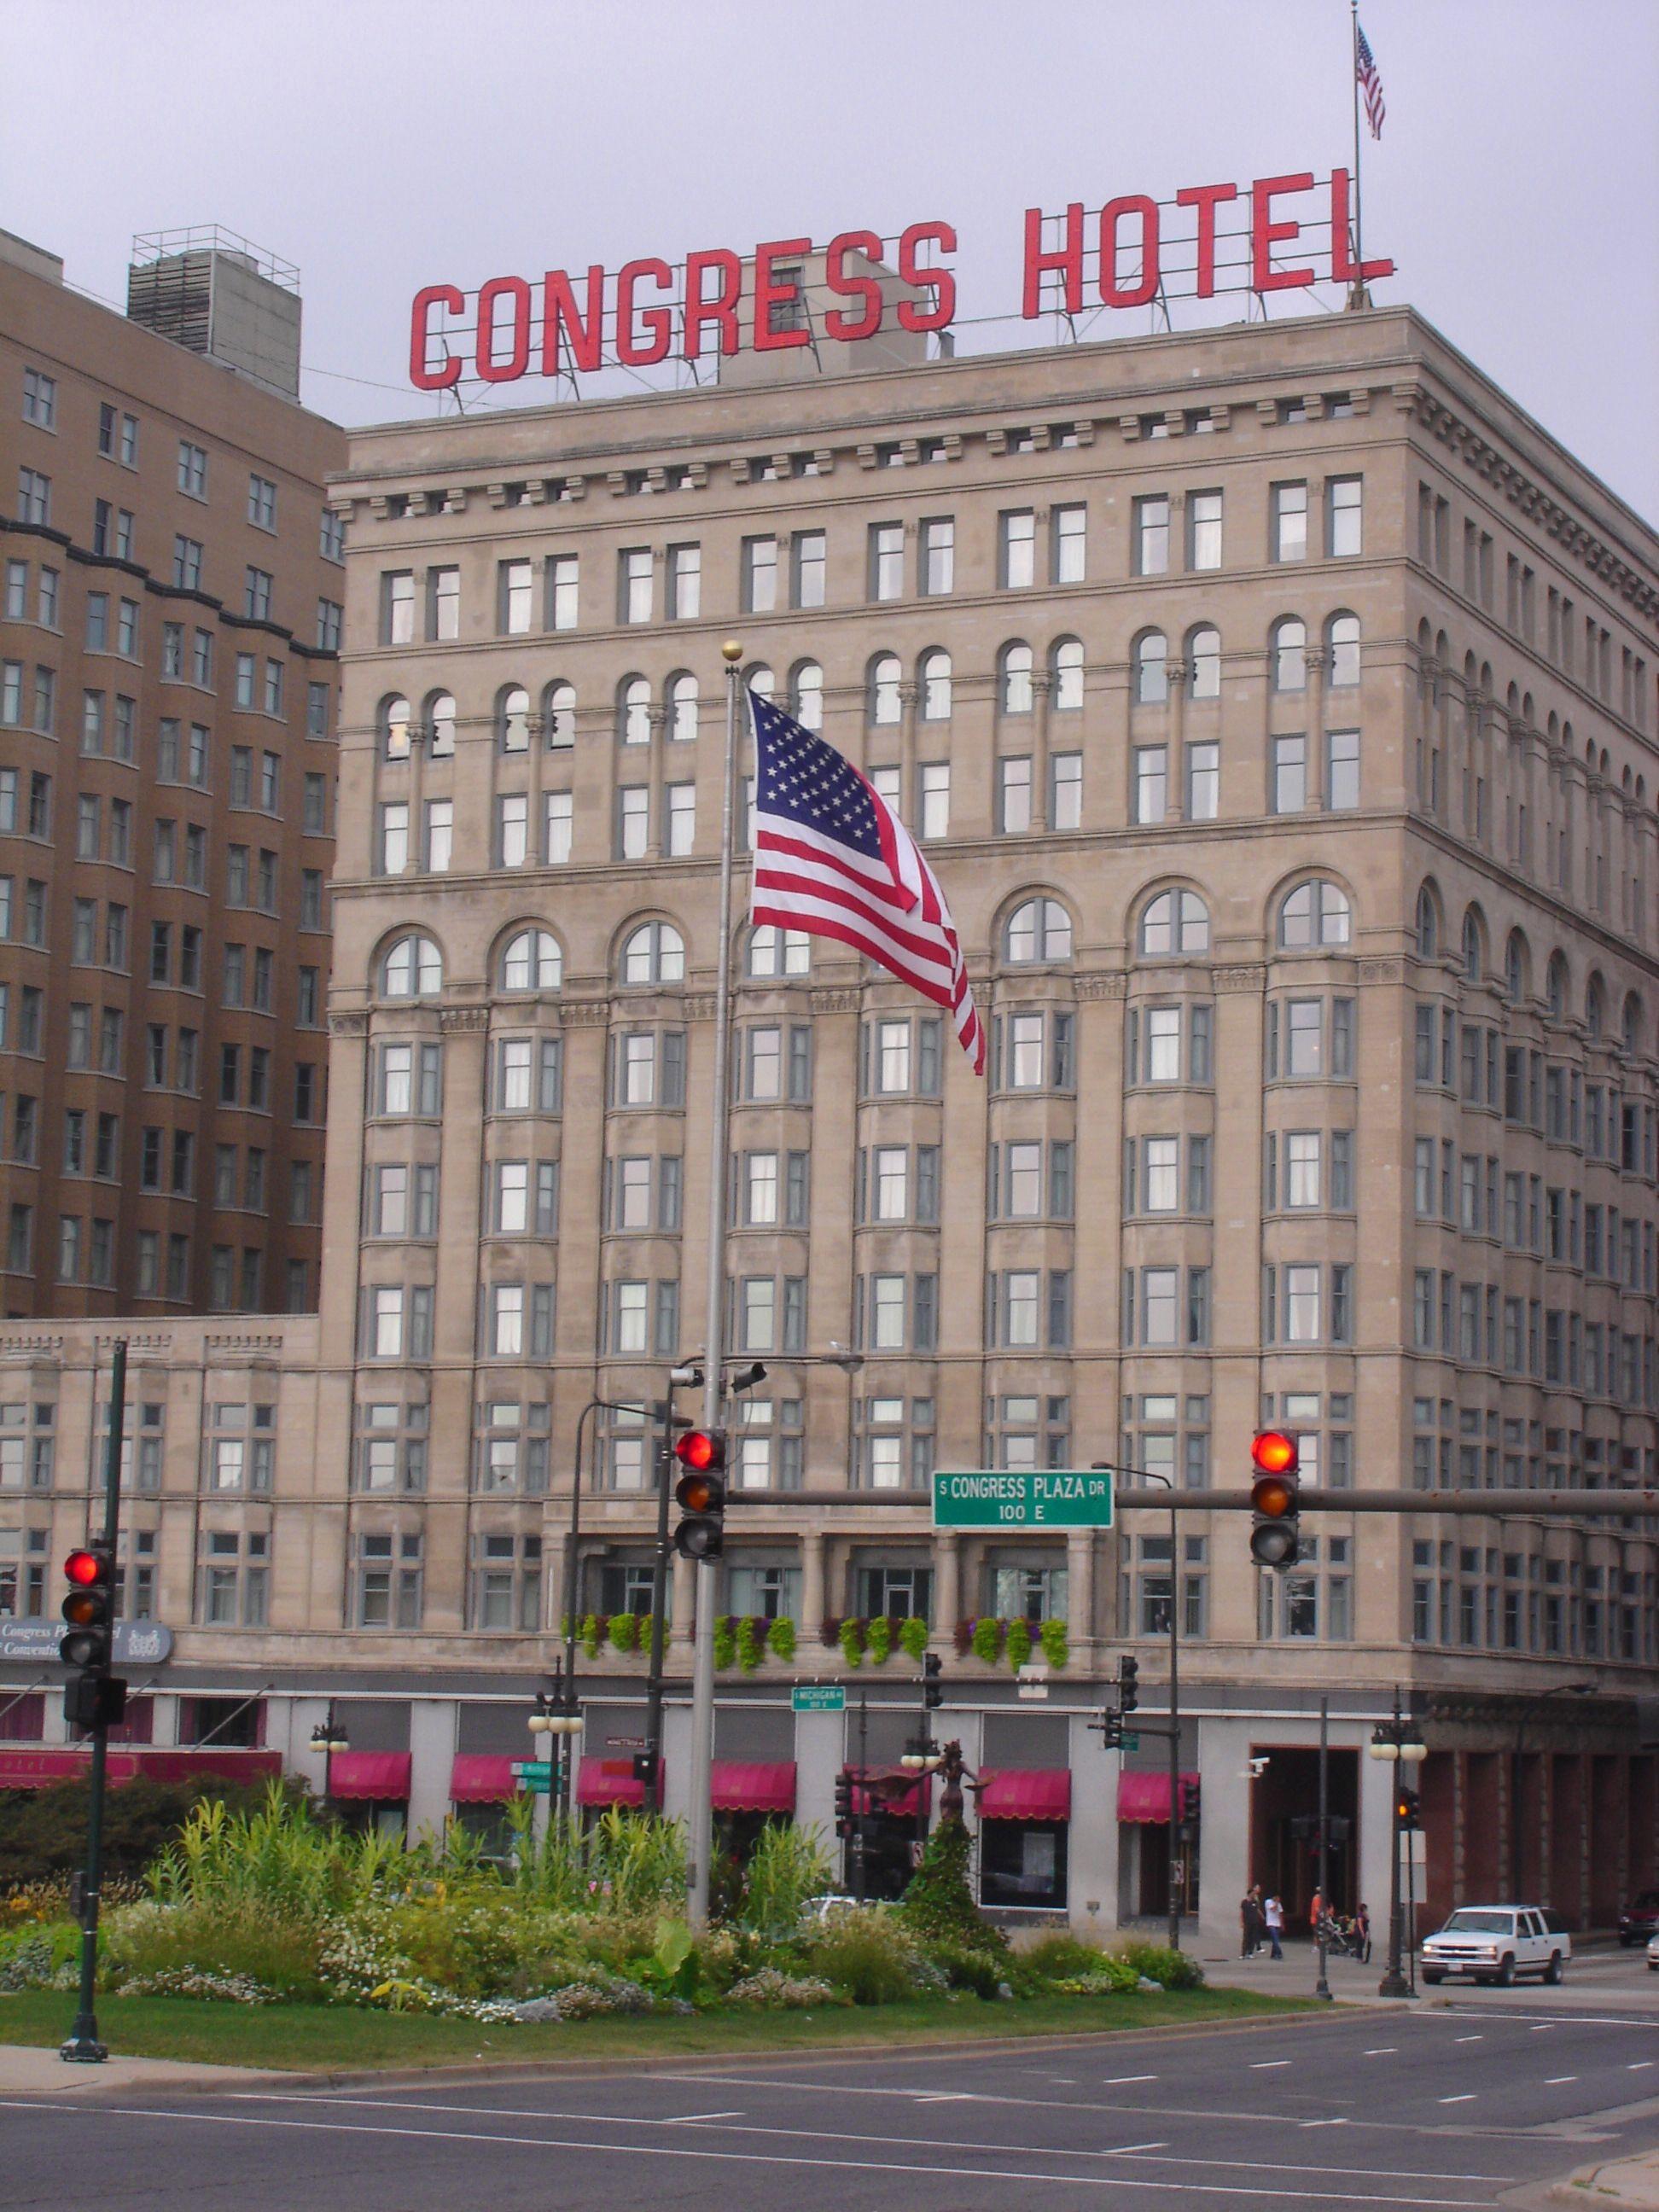 Stay Night In Haunted Hotel - Congress